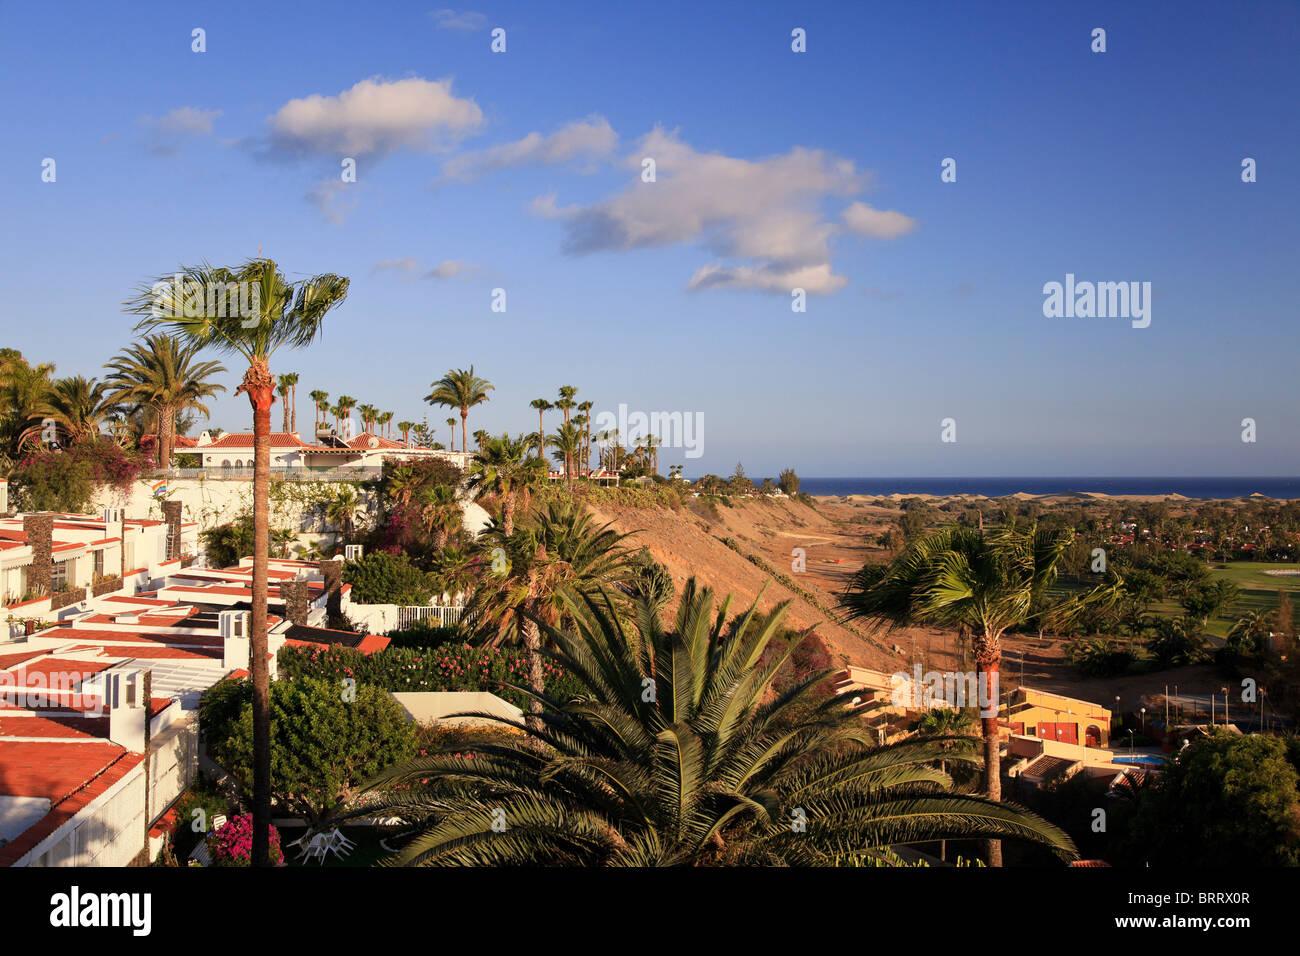 Kanarische Inseln, Gran Canaria, Blick auf Playa del Ingles und Maspalomas Resorts Stockbild